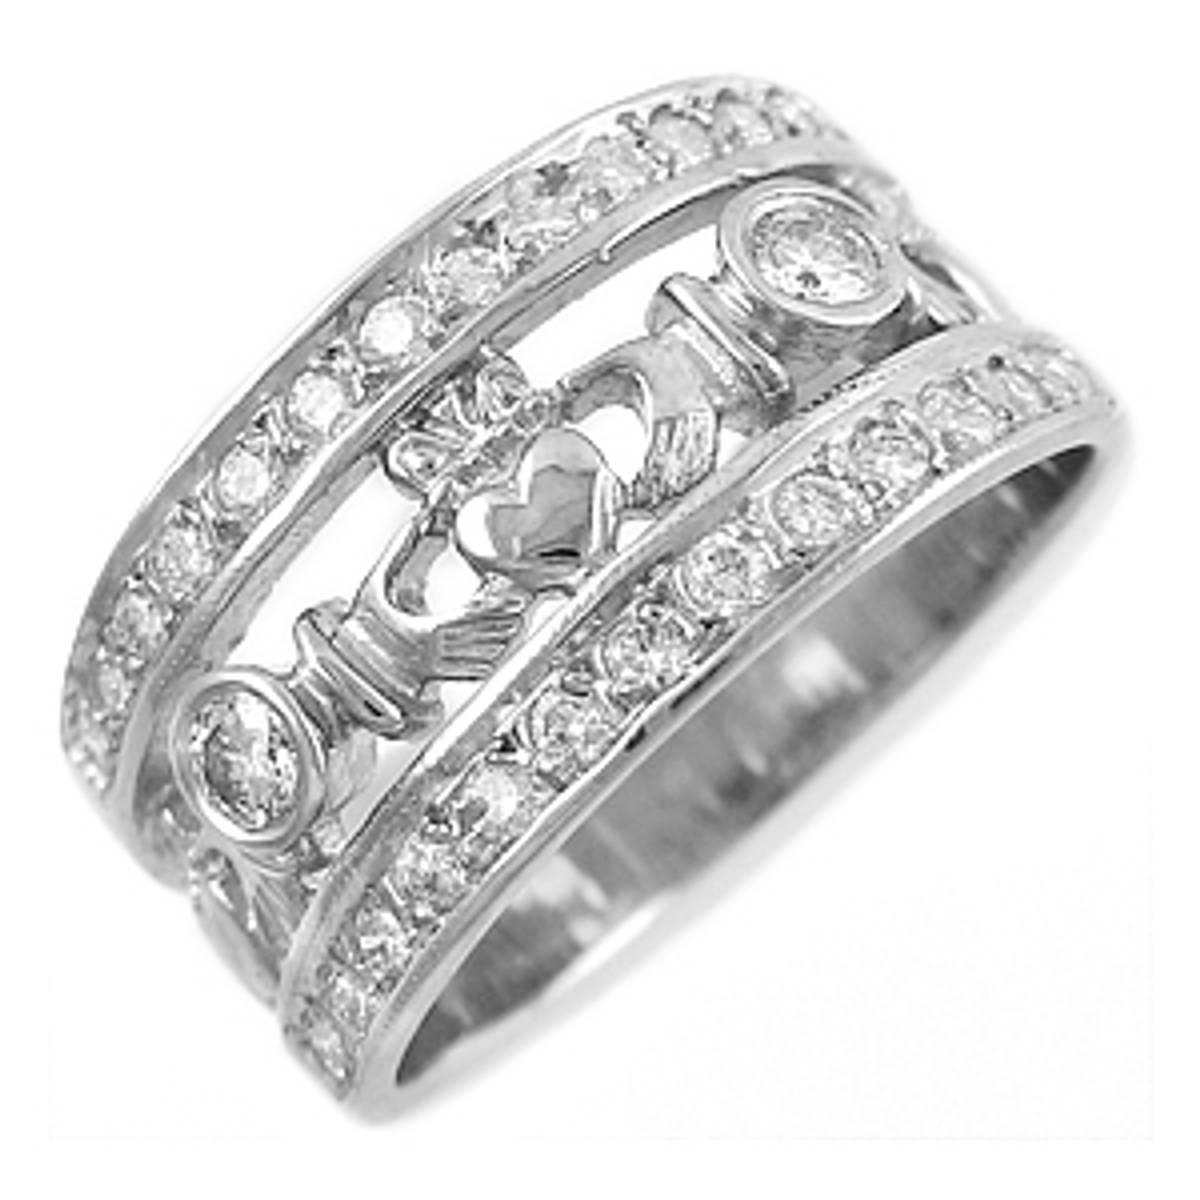 Irish made14 carat white gold 0.15cts/0.26cts diamonds claddagh engagement ring